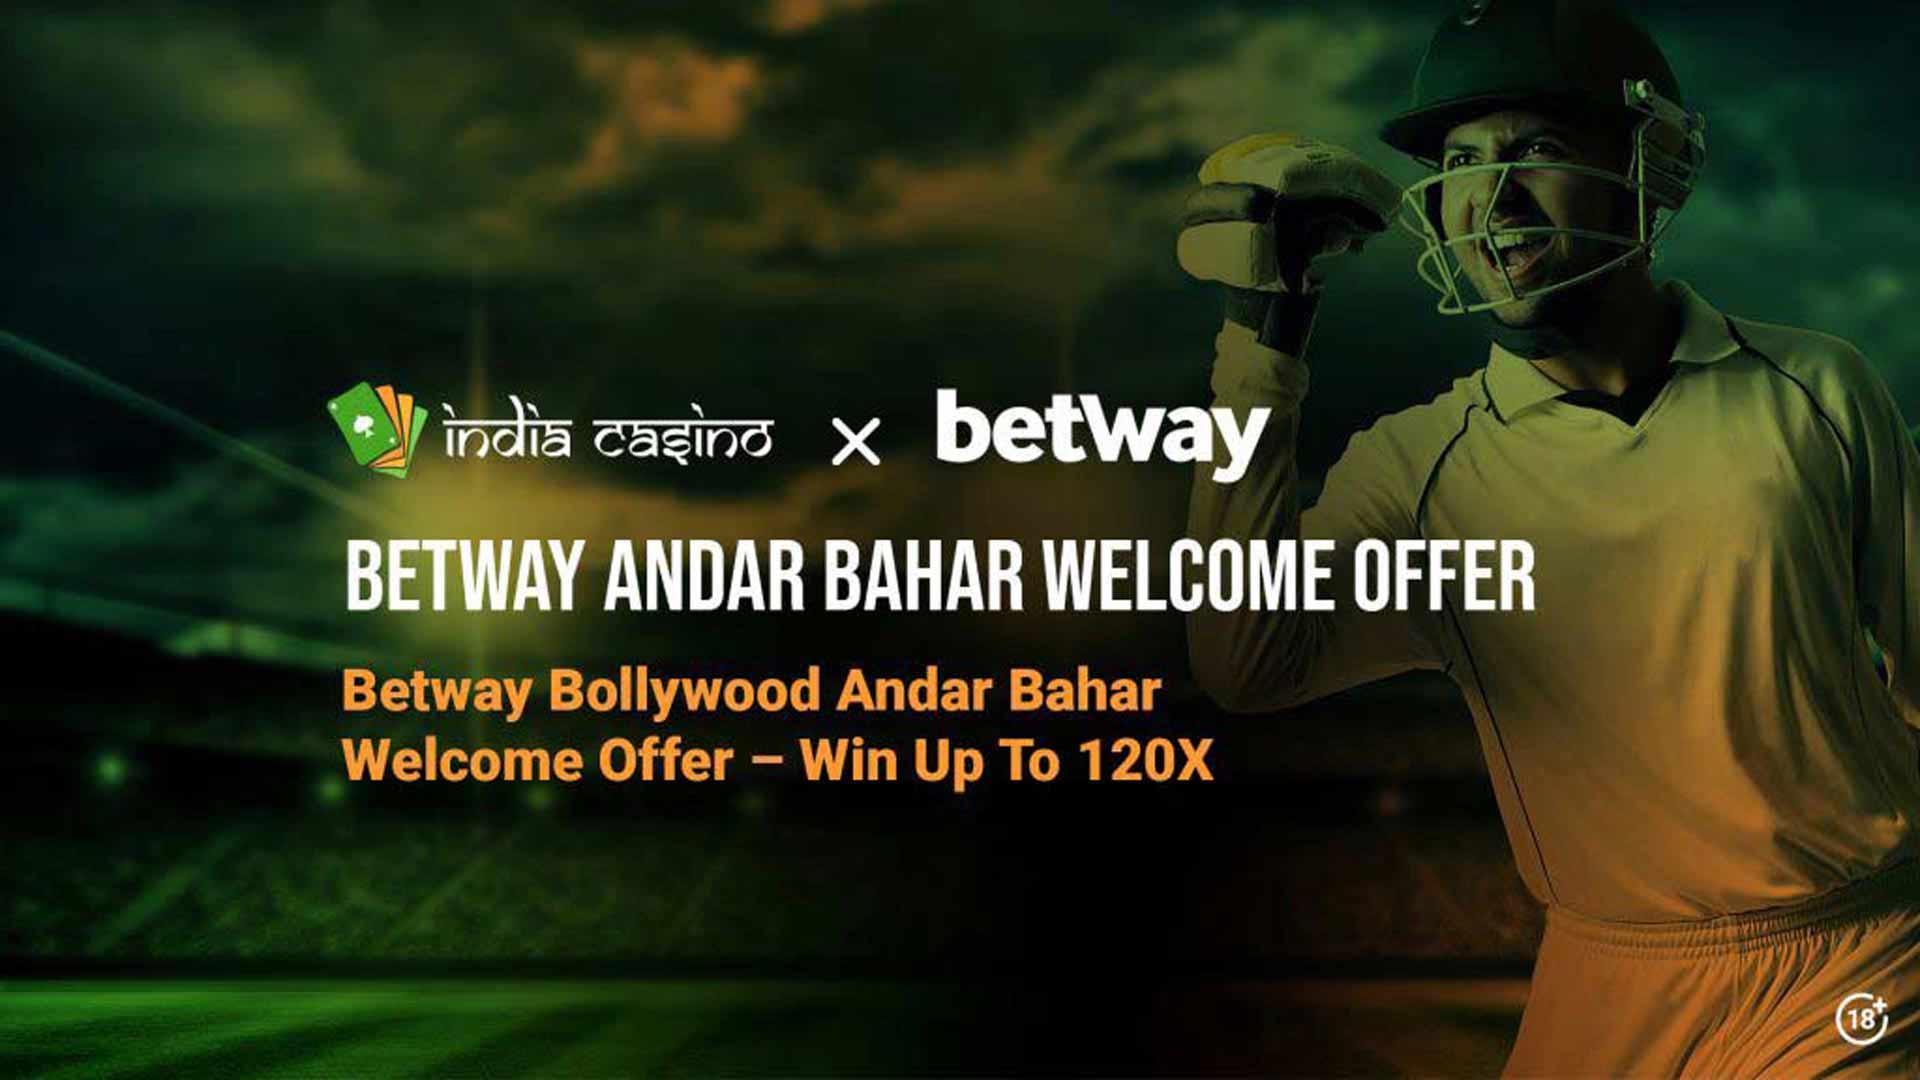 betway andar bahar welcome offer